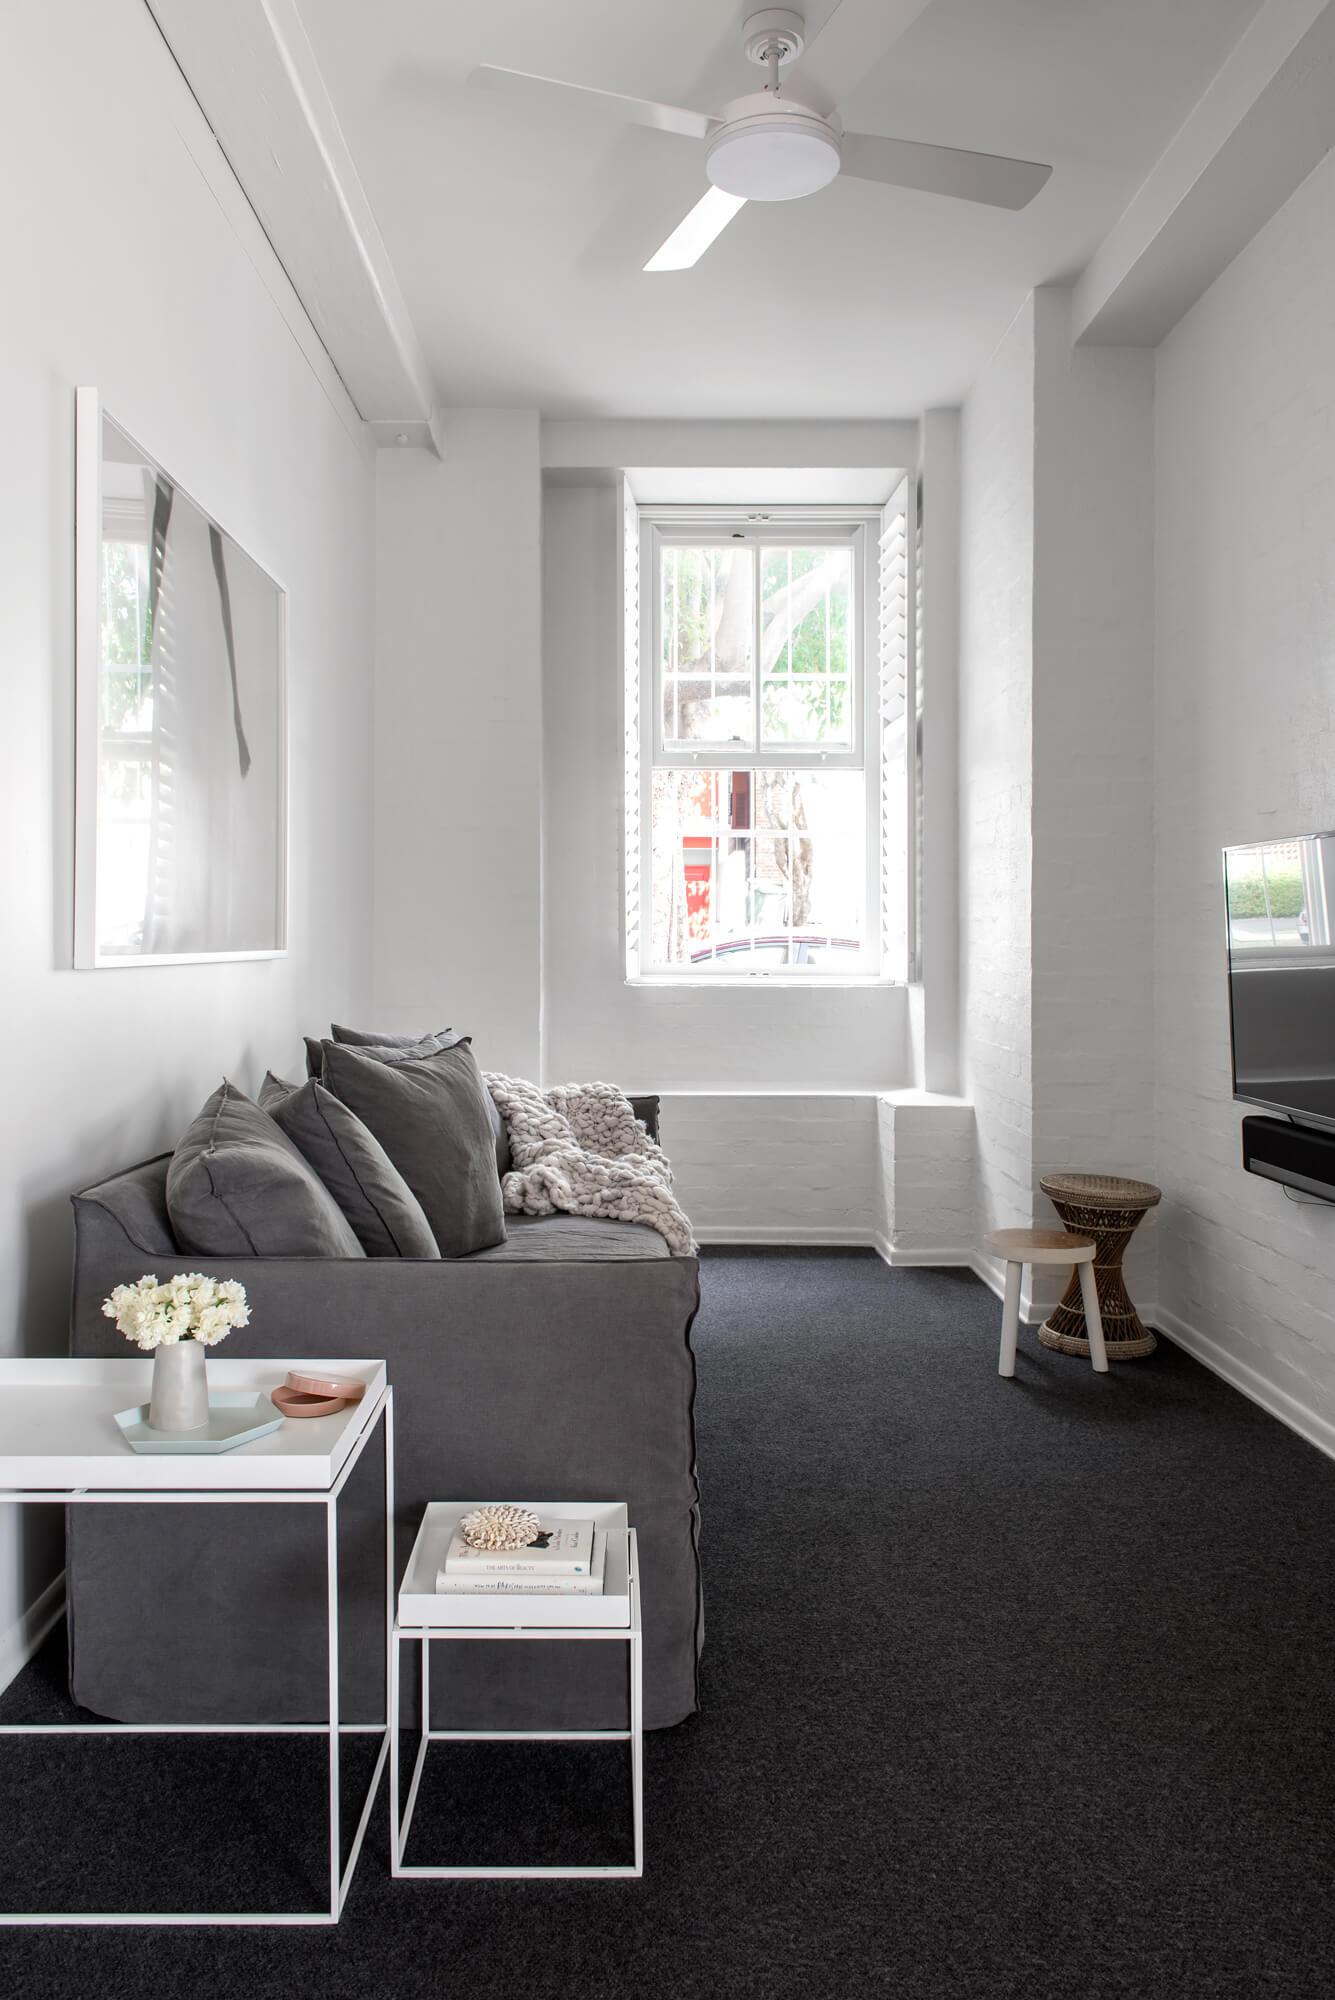 georgia-cannon-interior-designer-brisbane-project-m4-house-19.jpg